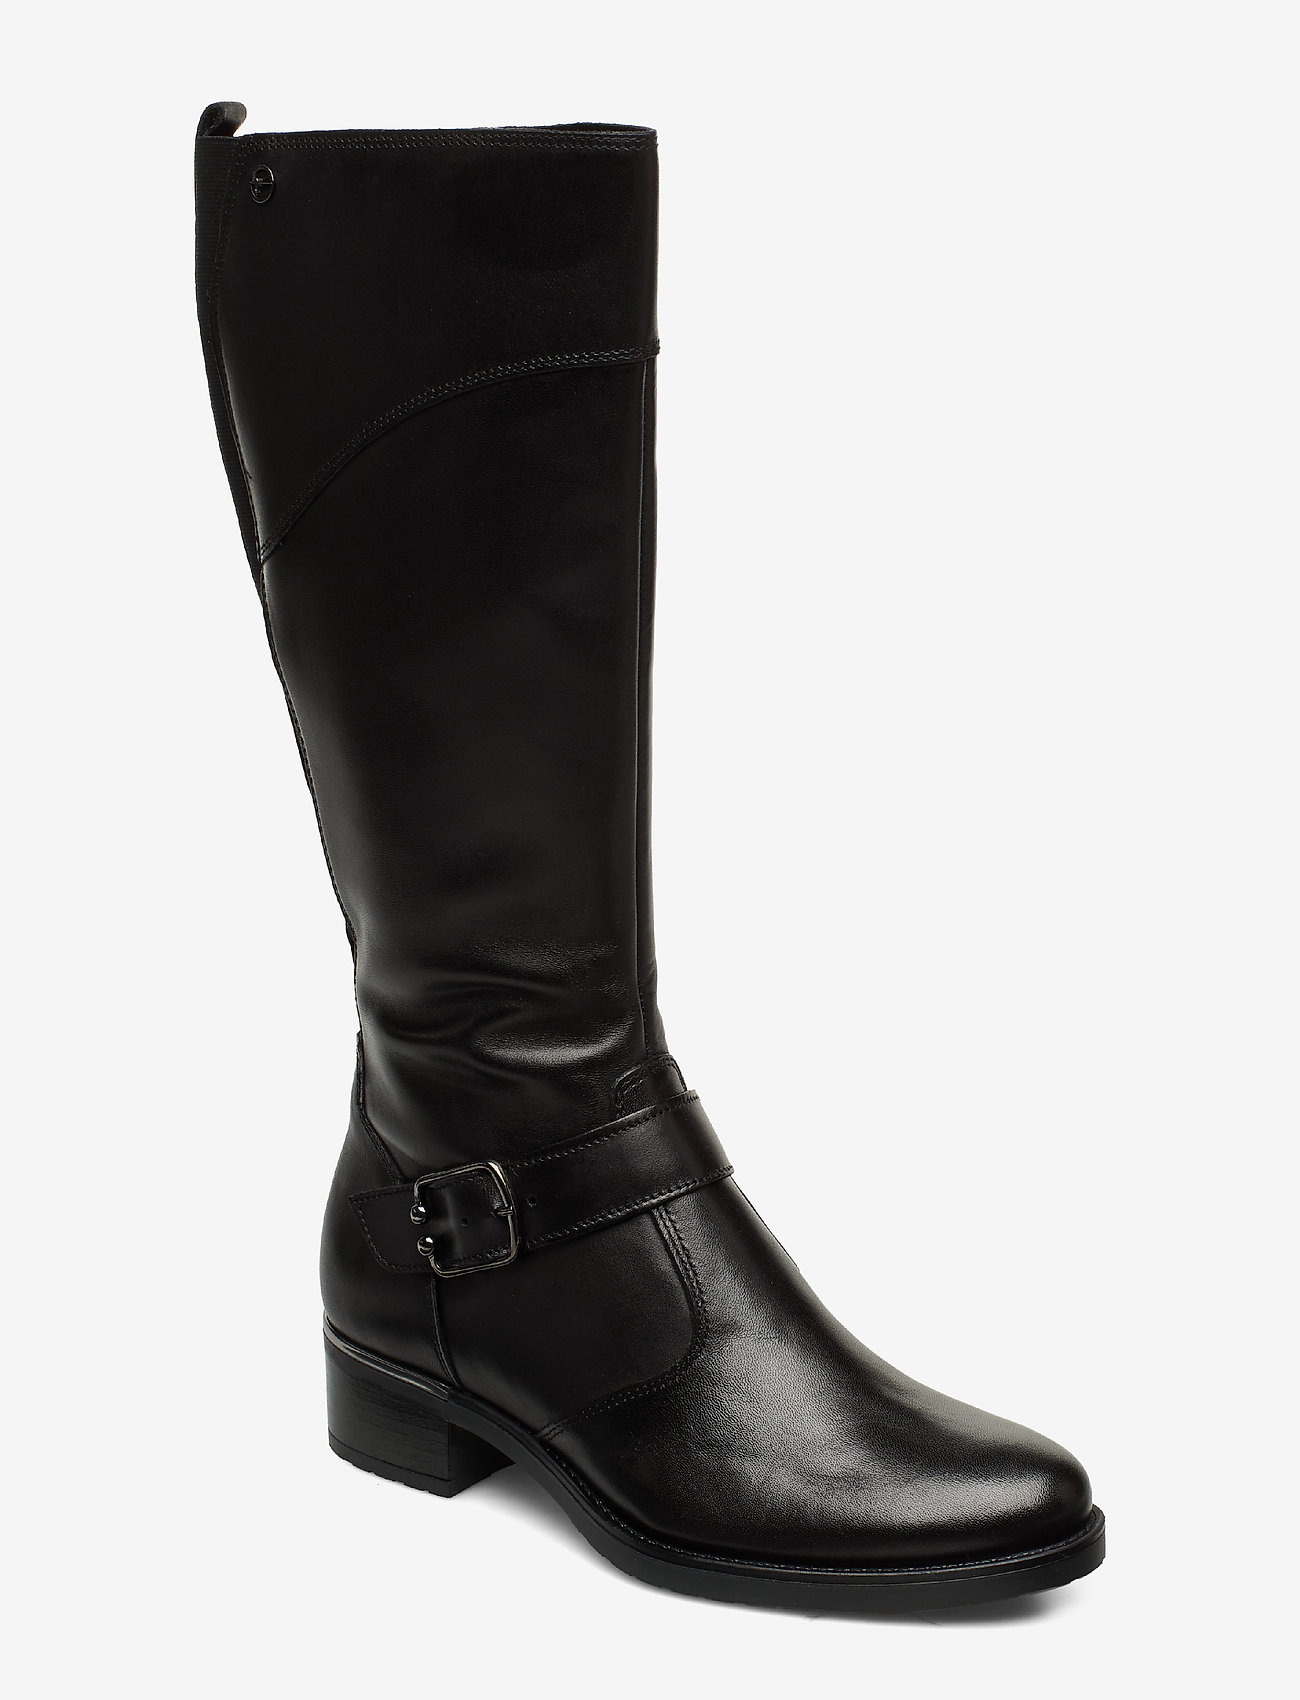 Tamaris - Boots - long boots - black - 0